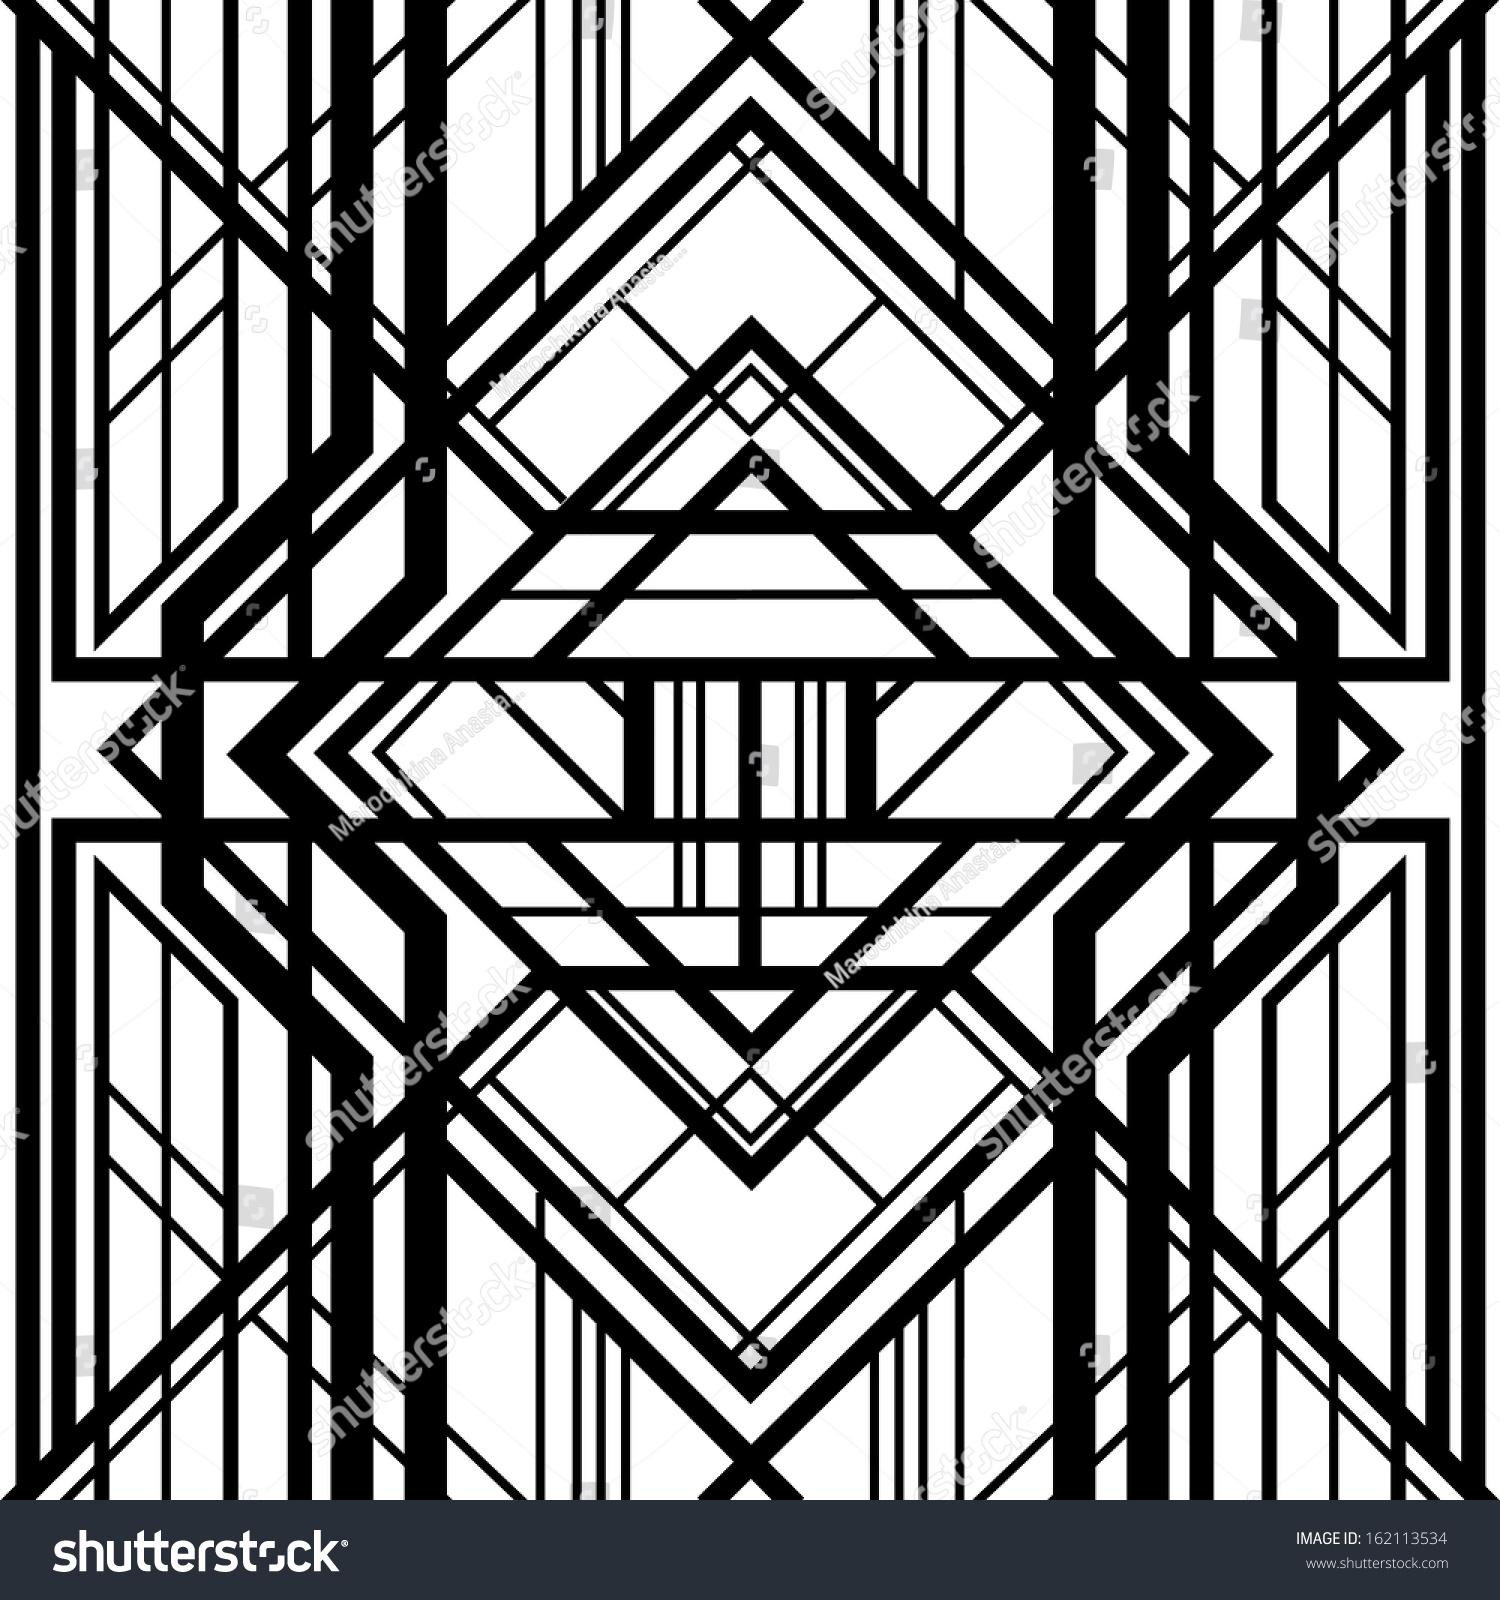 Seamless pattern abstract geometric background black stock